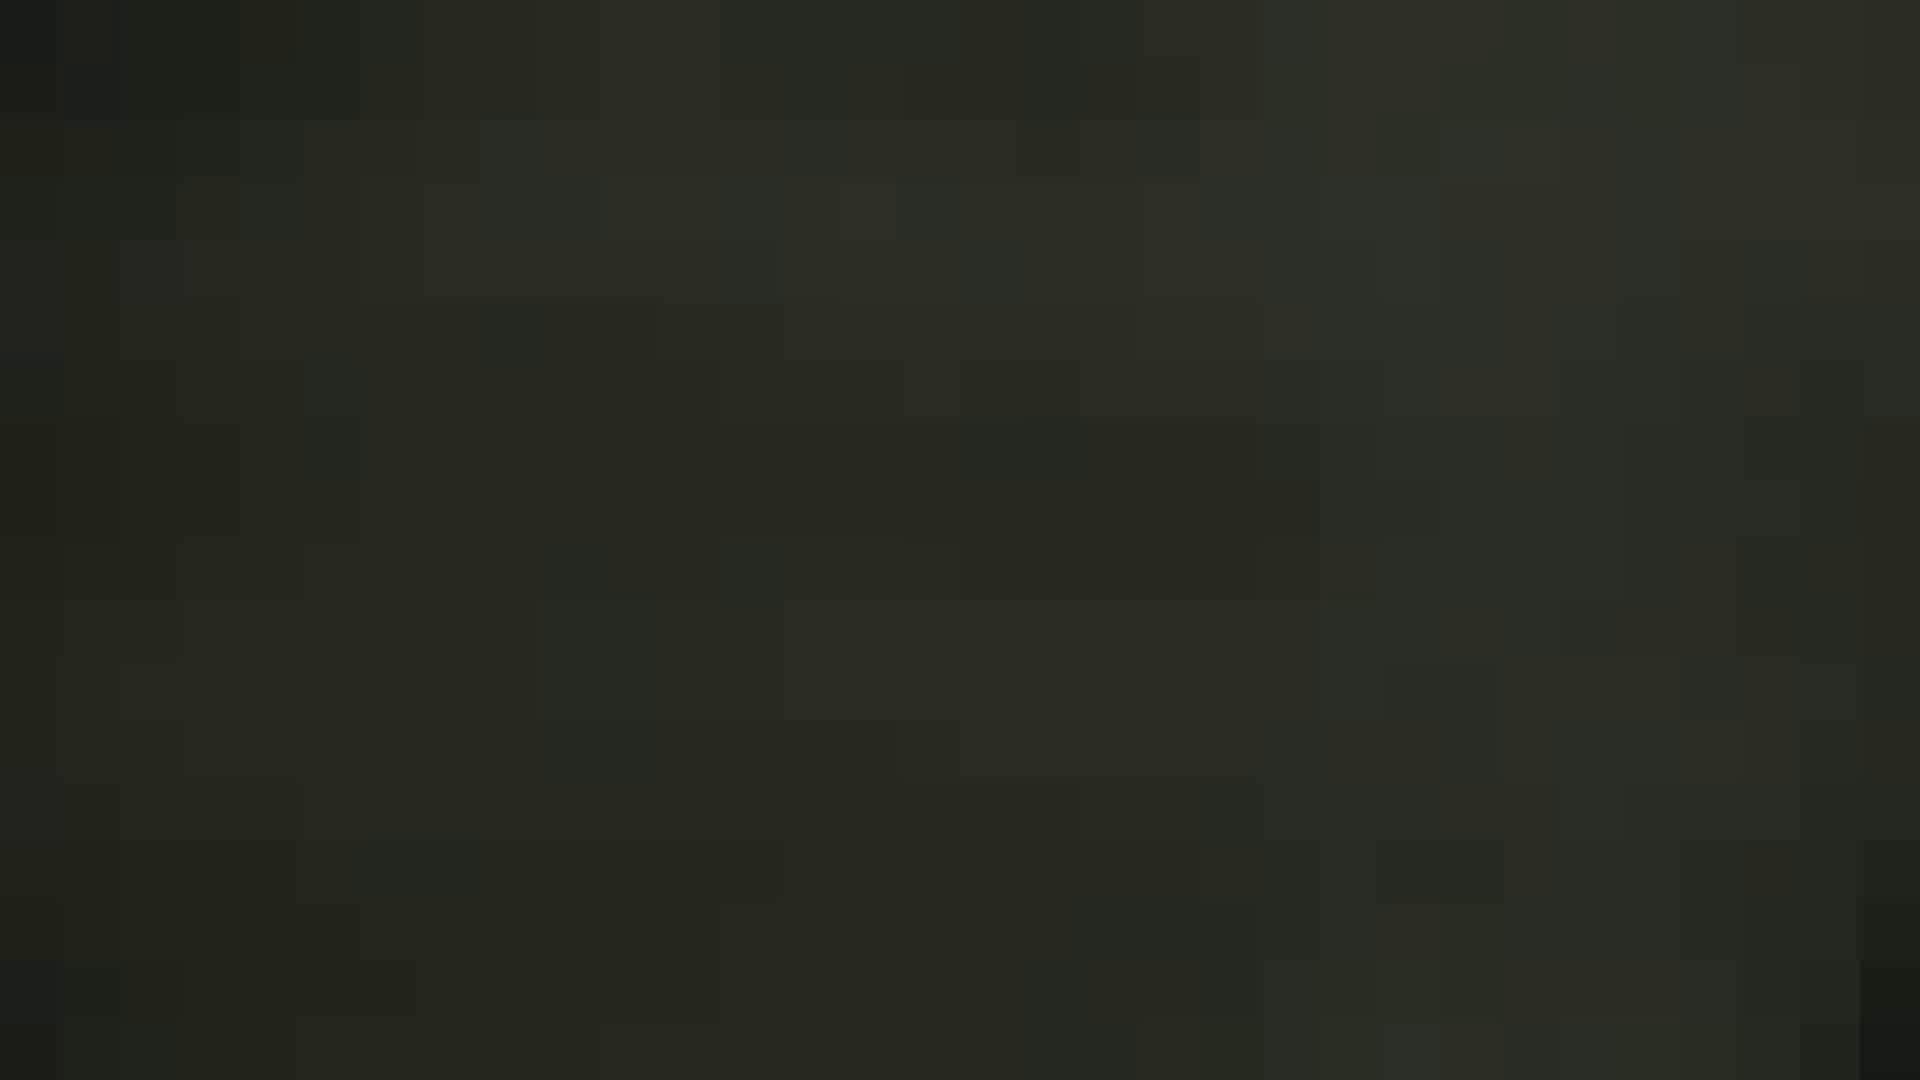 vol.25三十時間潜り、一つしか出会えない完璧桃尻編 byお銀 美人 えろ無修正画像 92pic 11